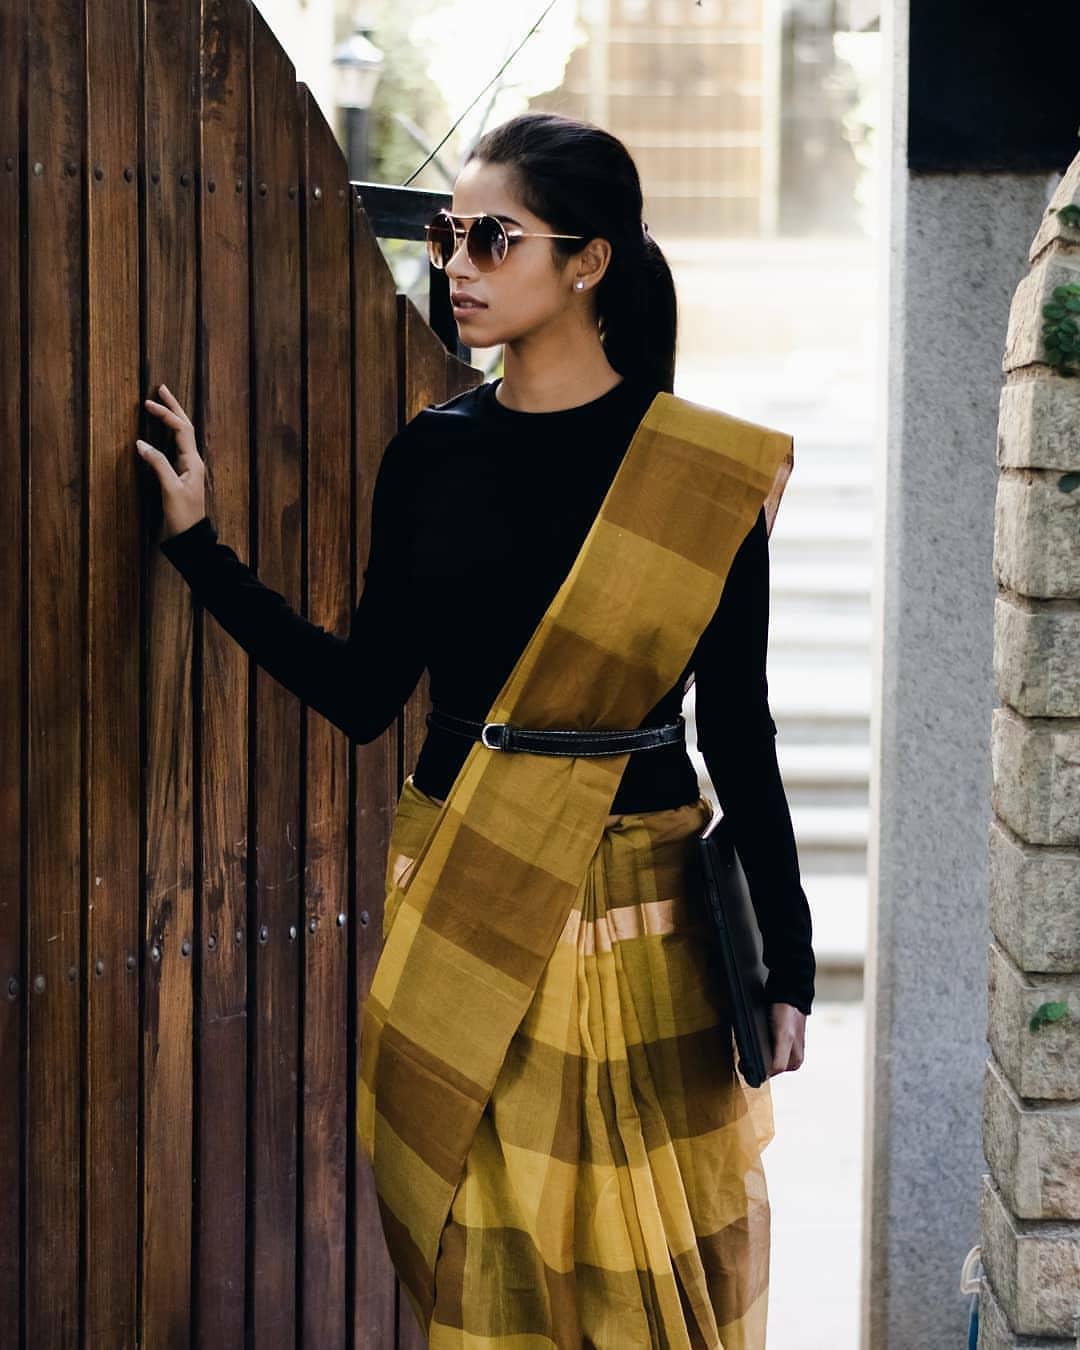 sun-glasses-and-sarees (2)